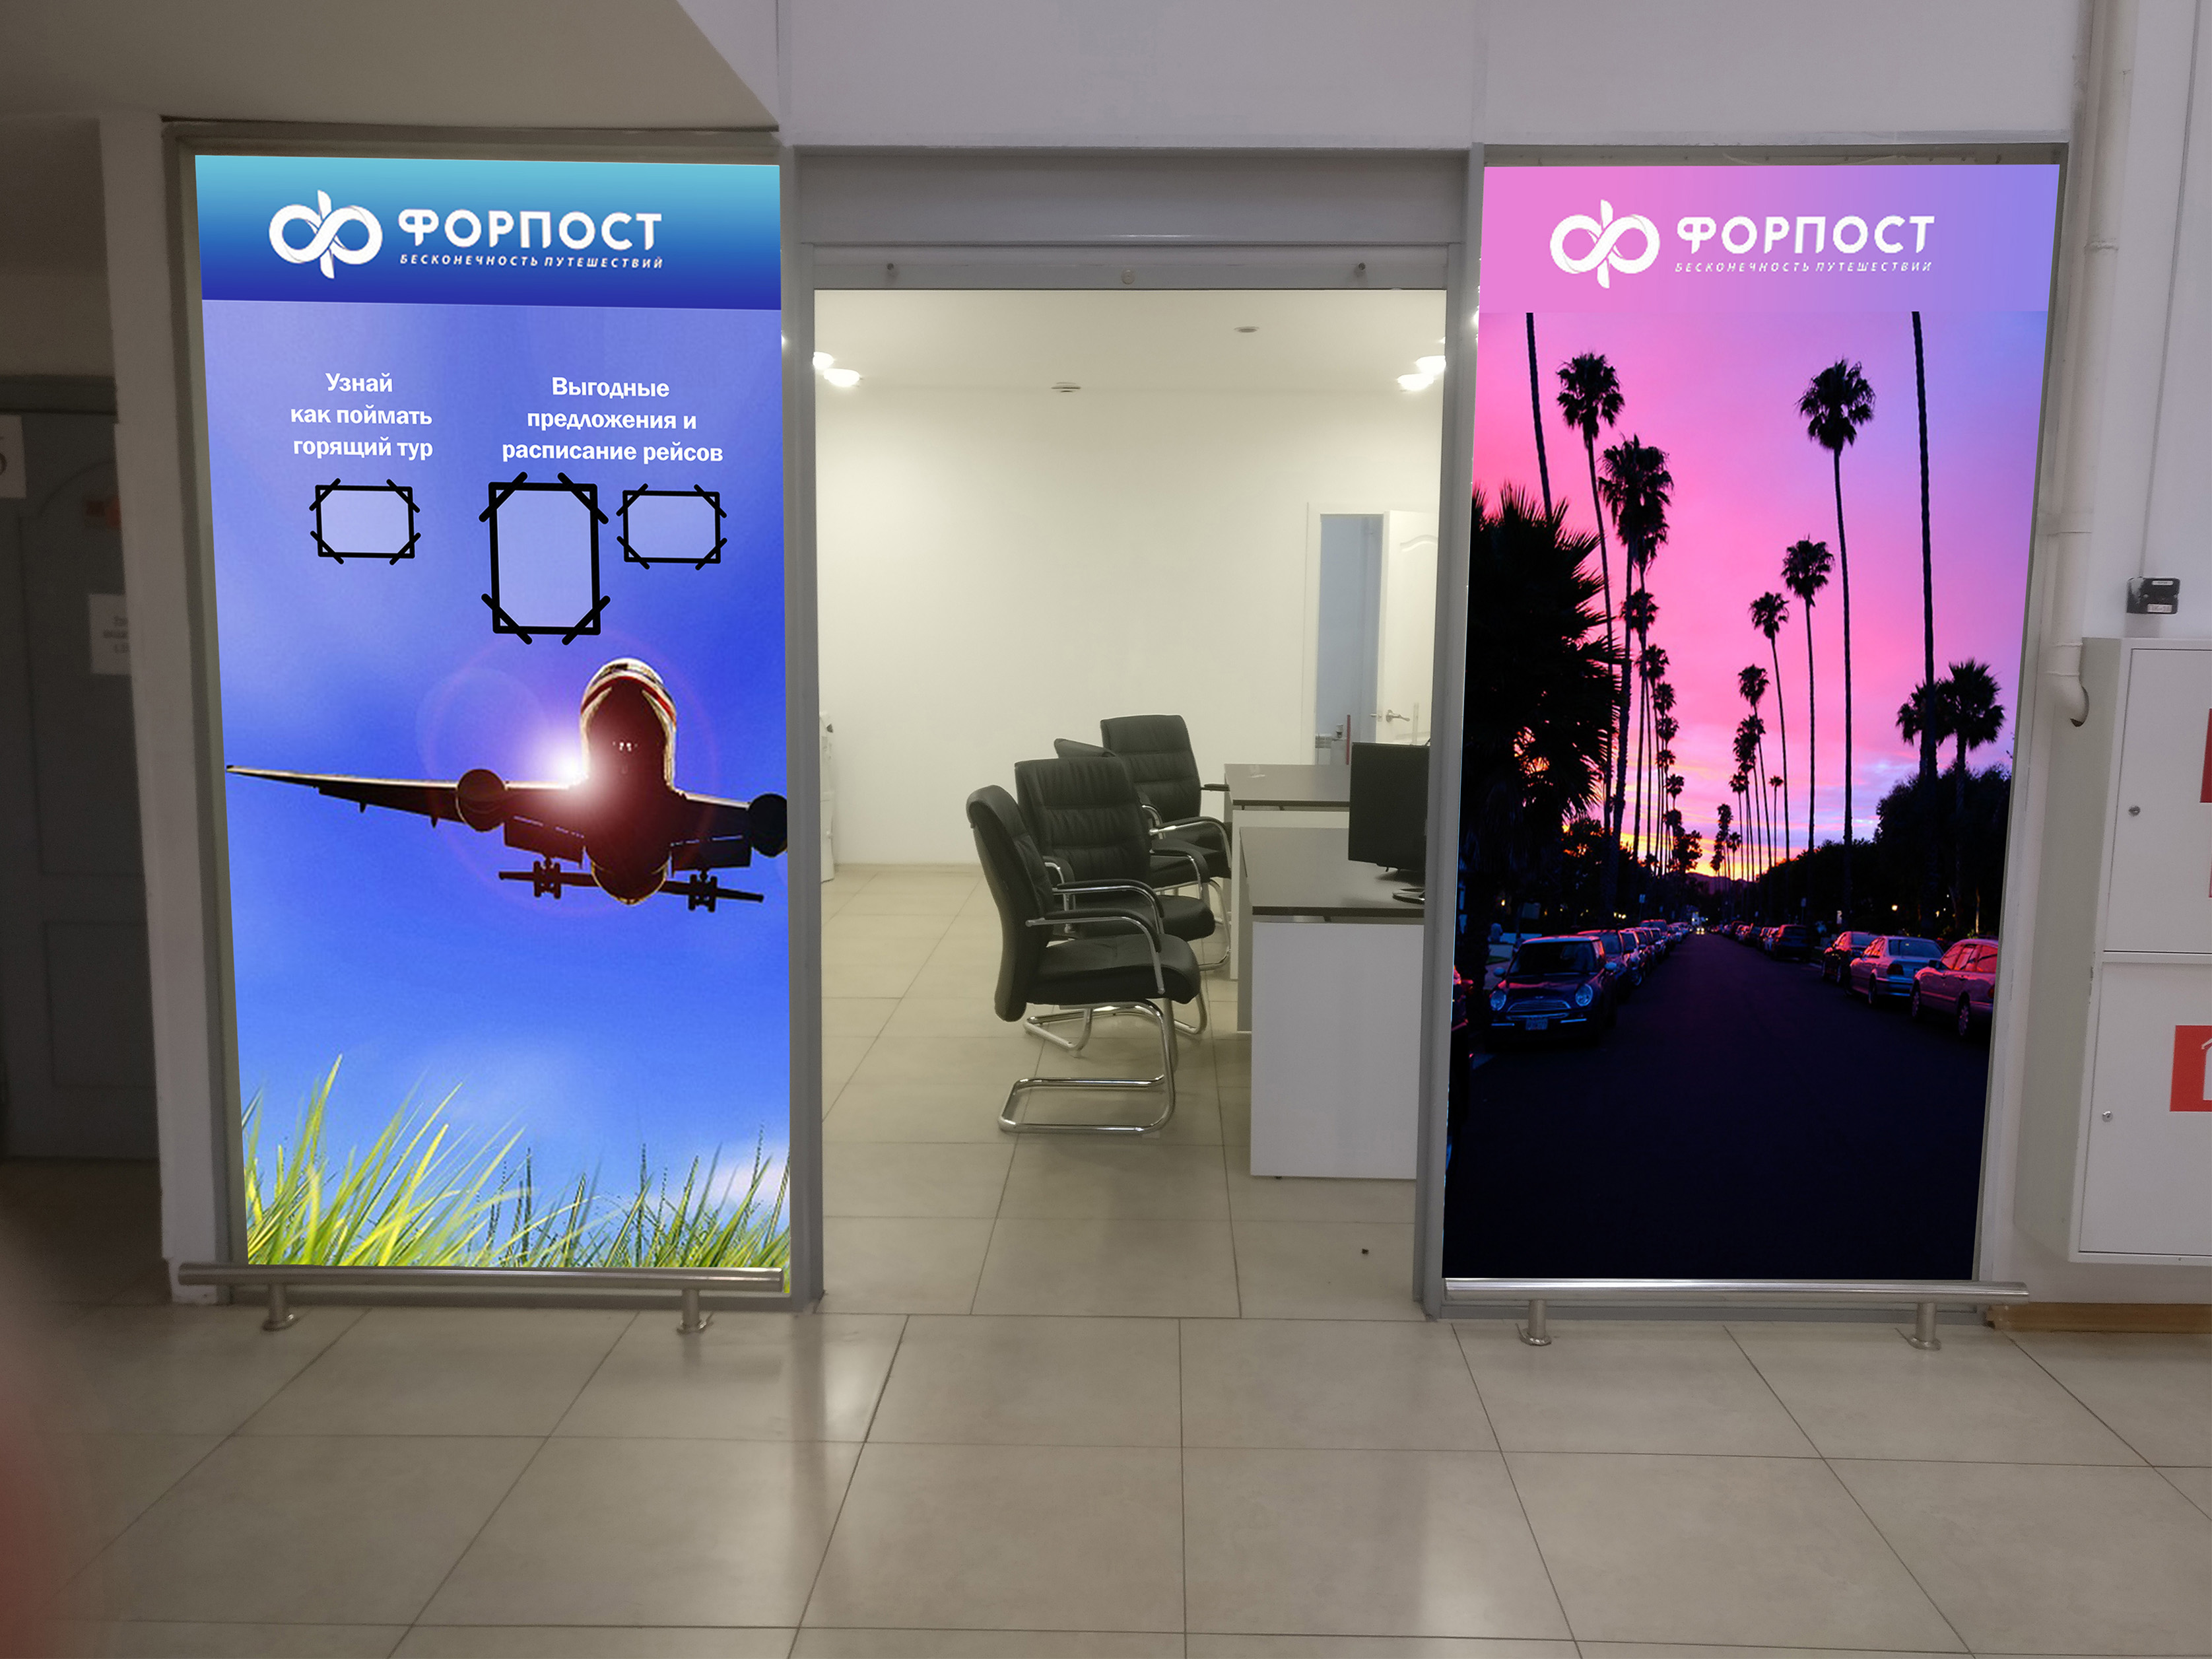 Дизайн двух плакатов фото f_2855a0dd71c7daa8.jpg